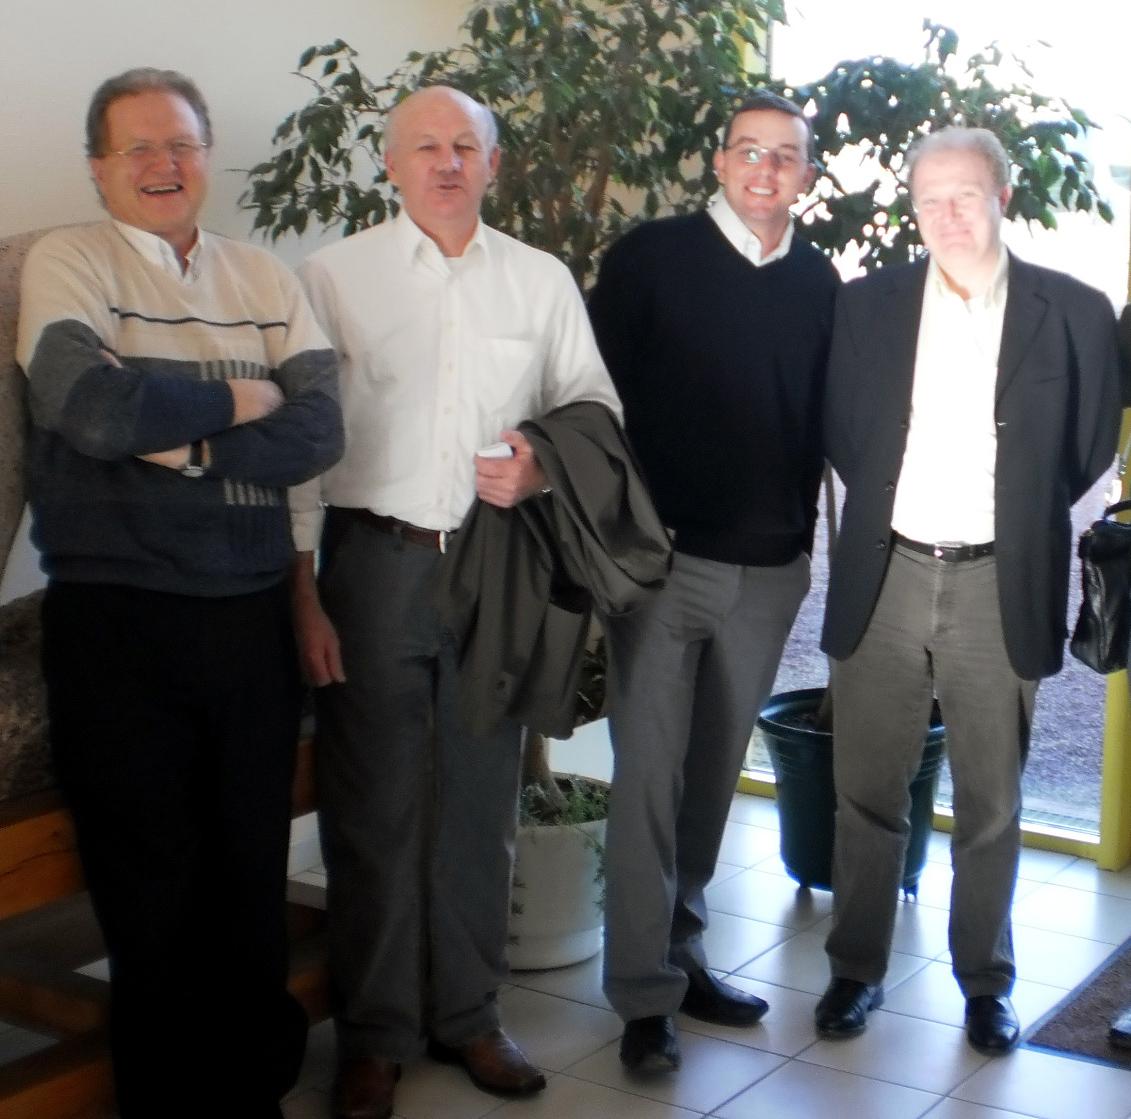 Carboni fecha parceria com Pen Ar Lan e passará a trabalhar também com tecnologia francesa PB240247%20II